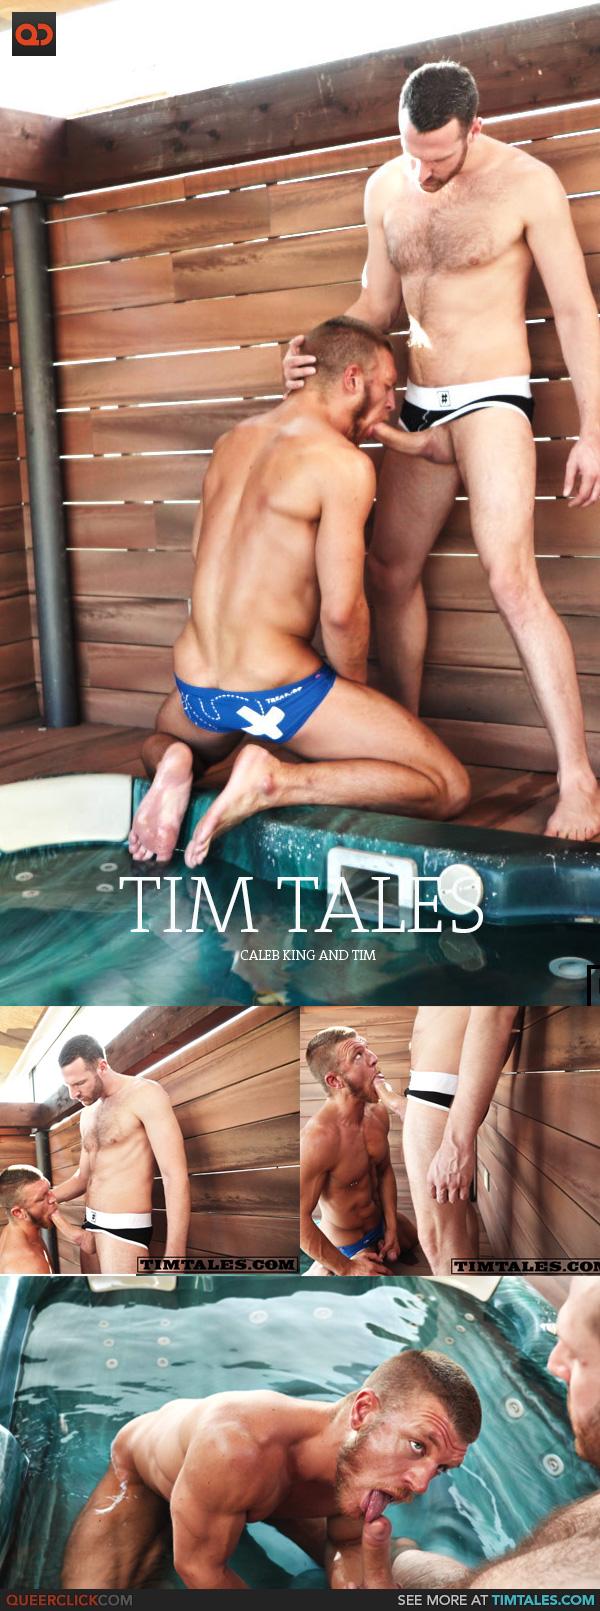 timtales-caleb-king